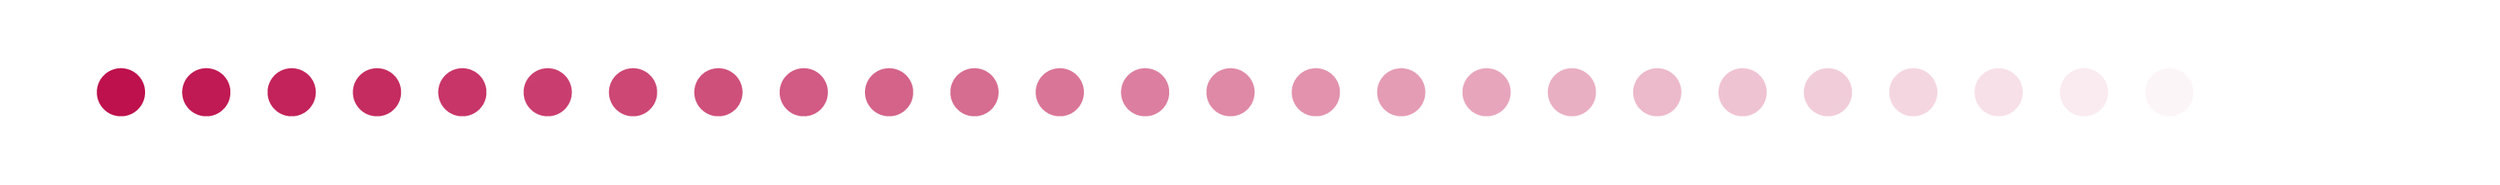 TRI Dots.jpg